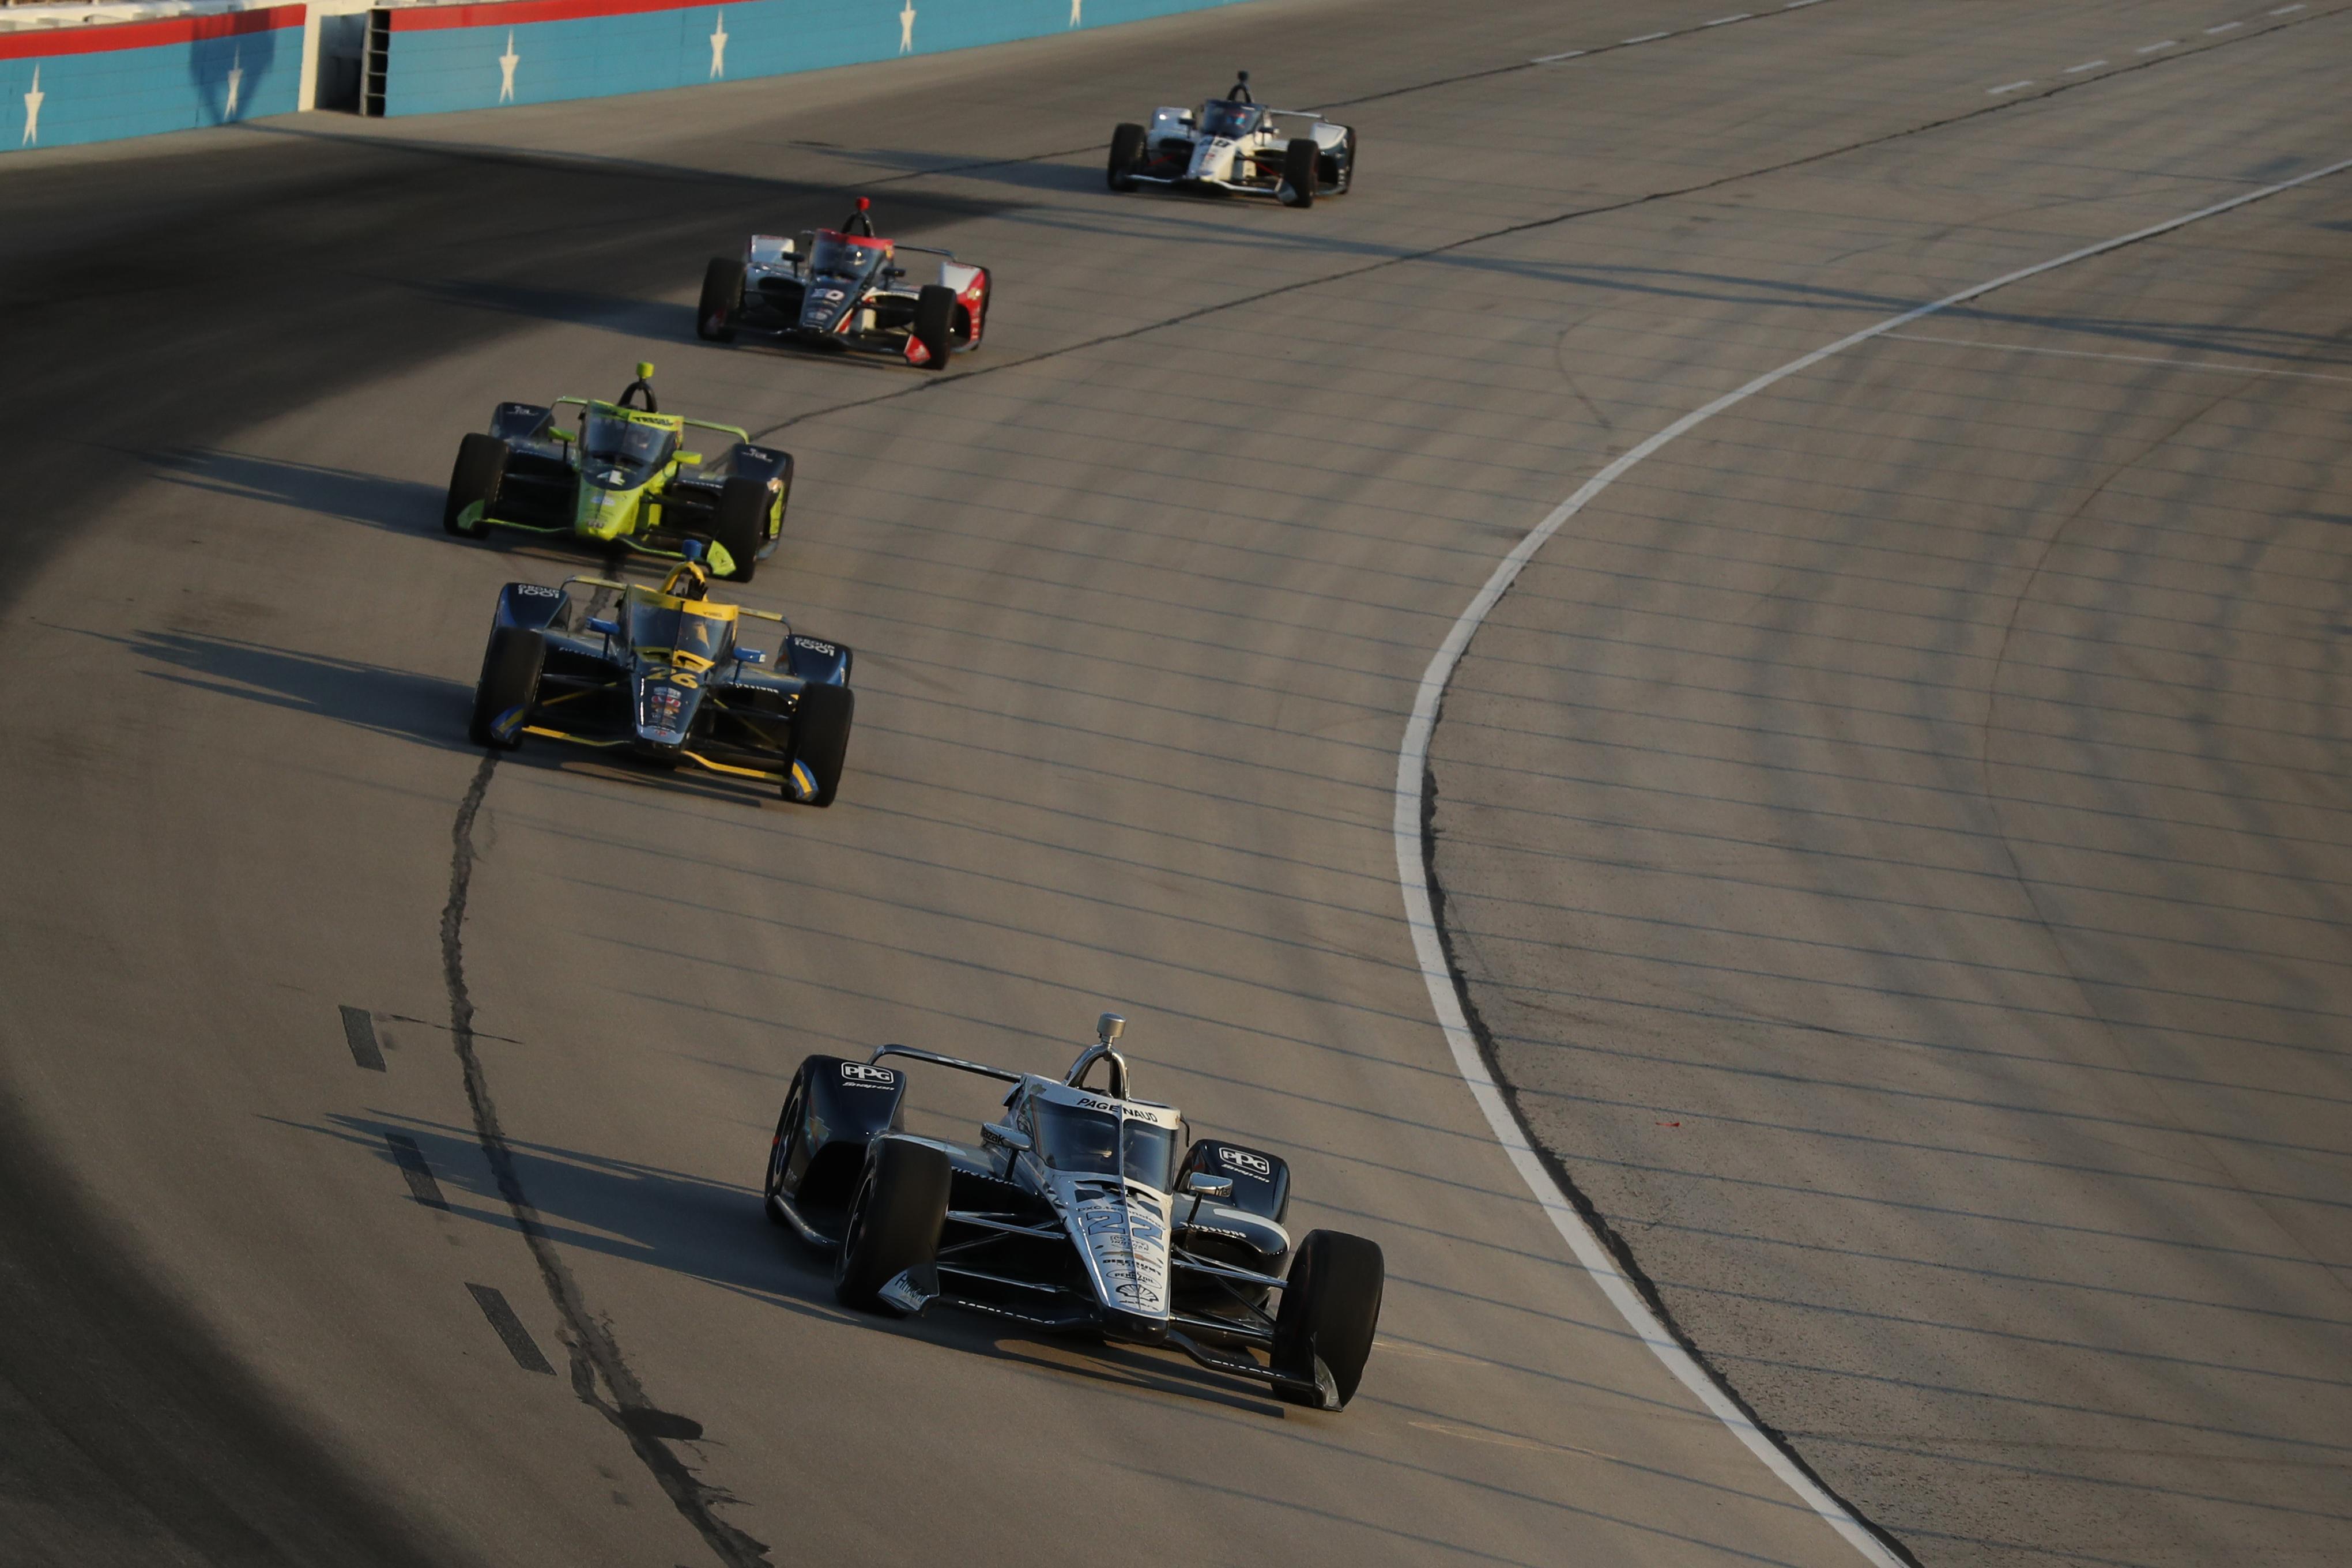 Simon Pagenaud IndyCar Texas aeroscreen 2020